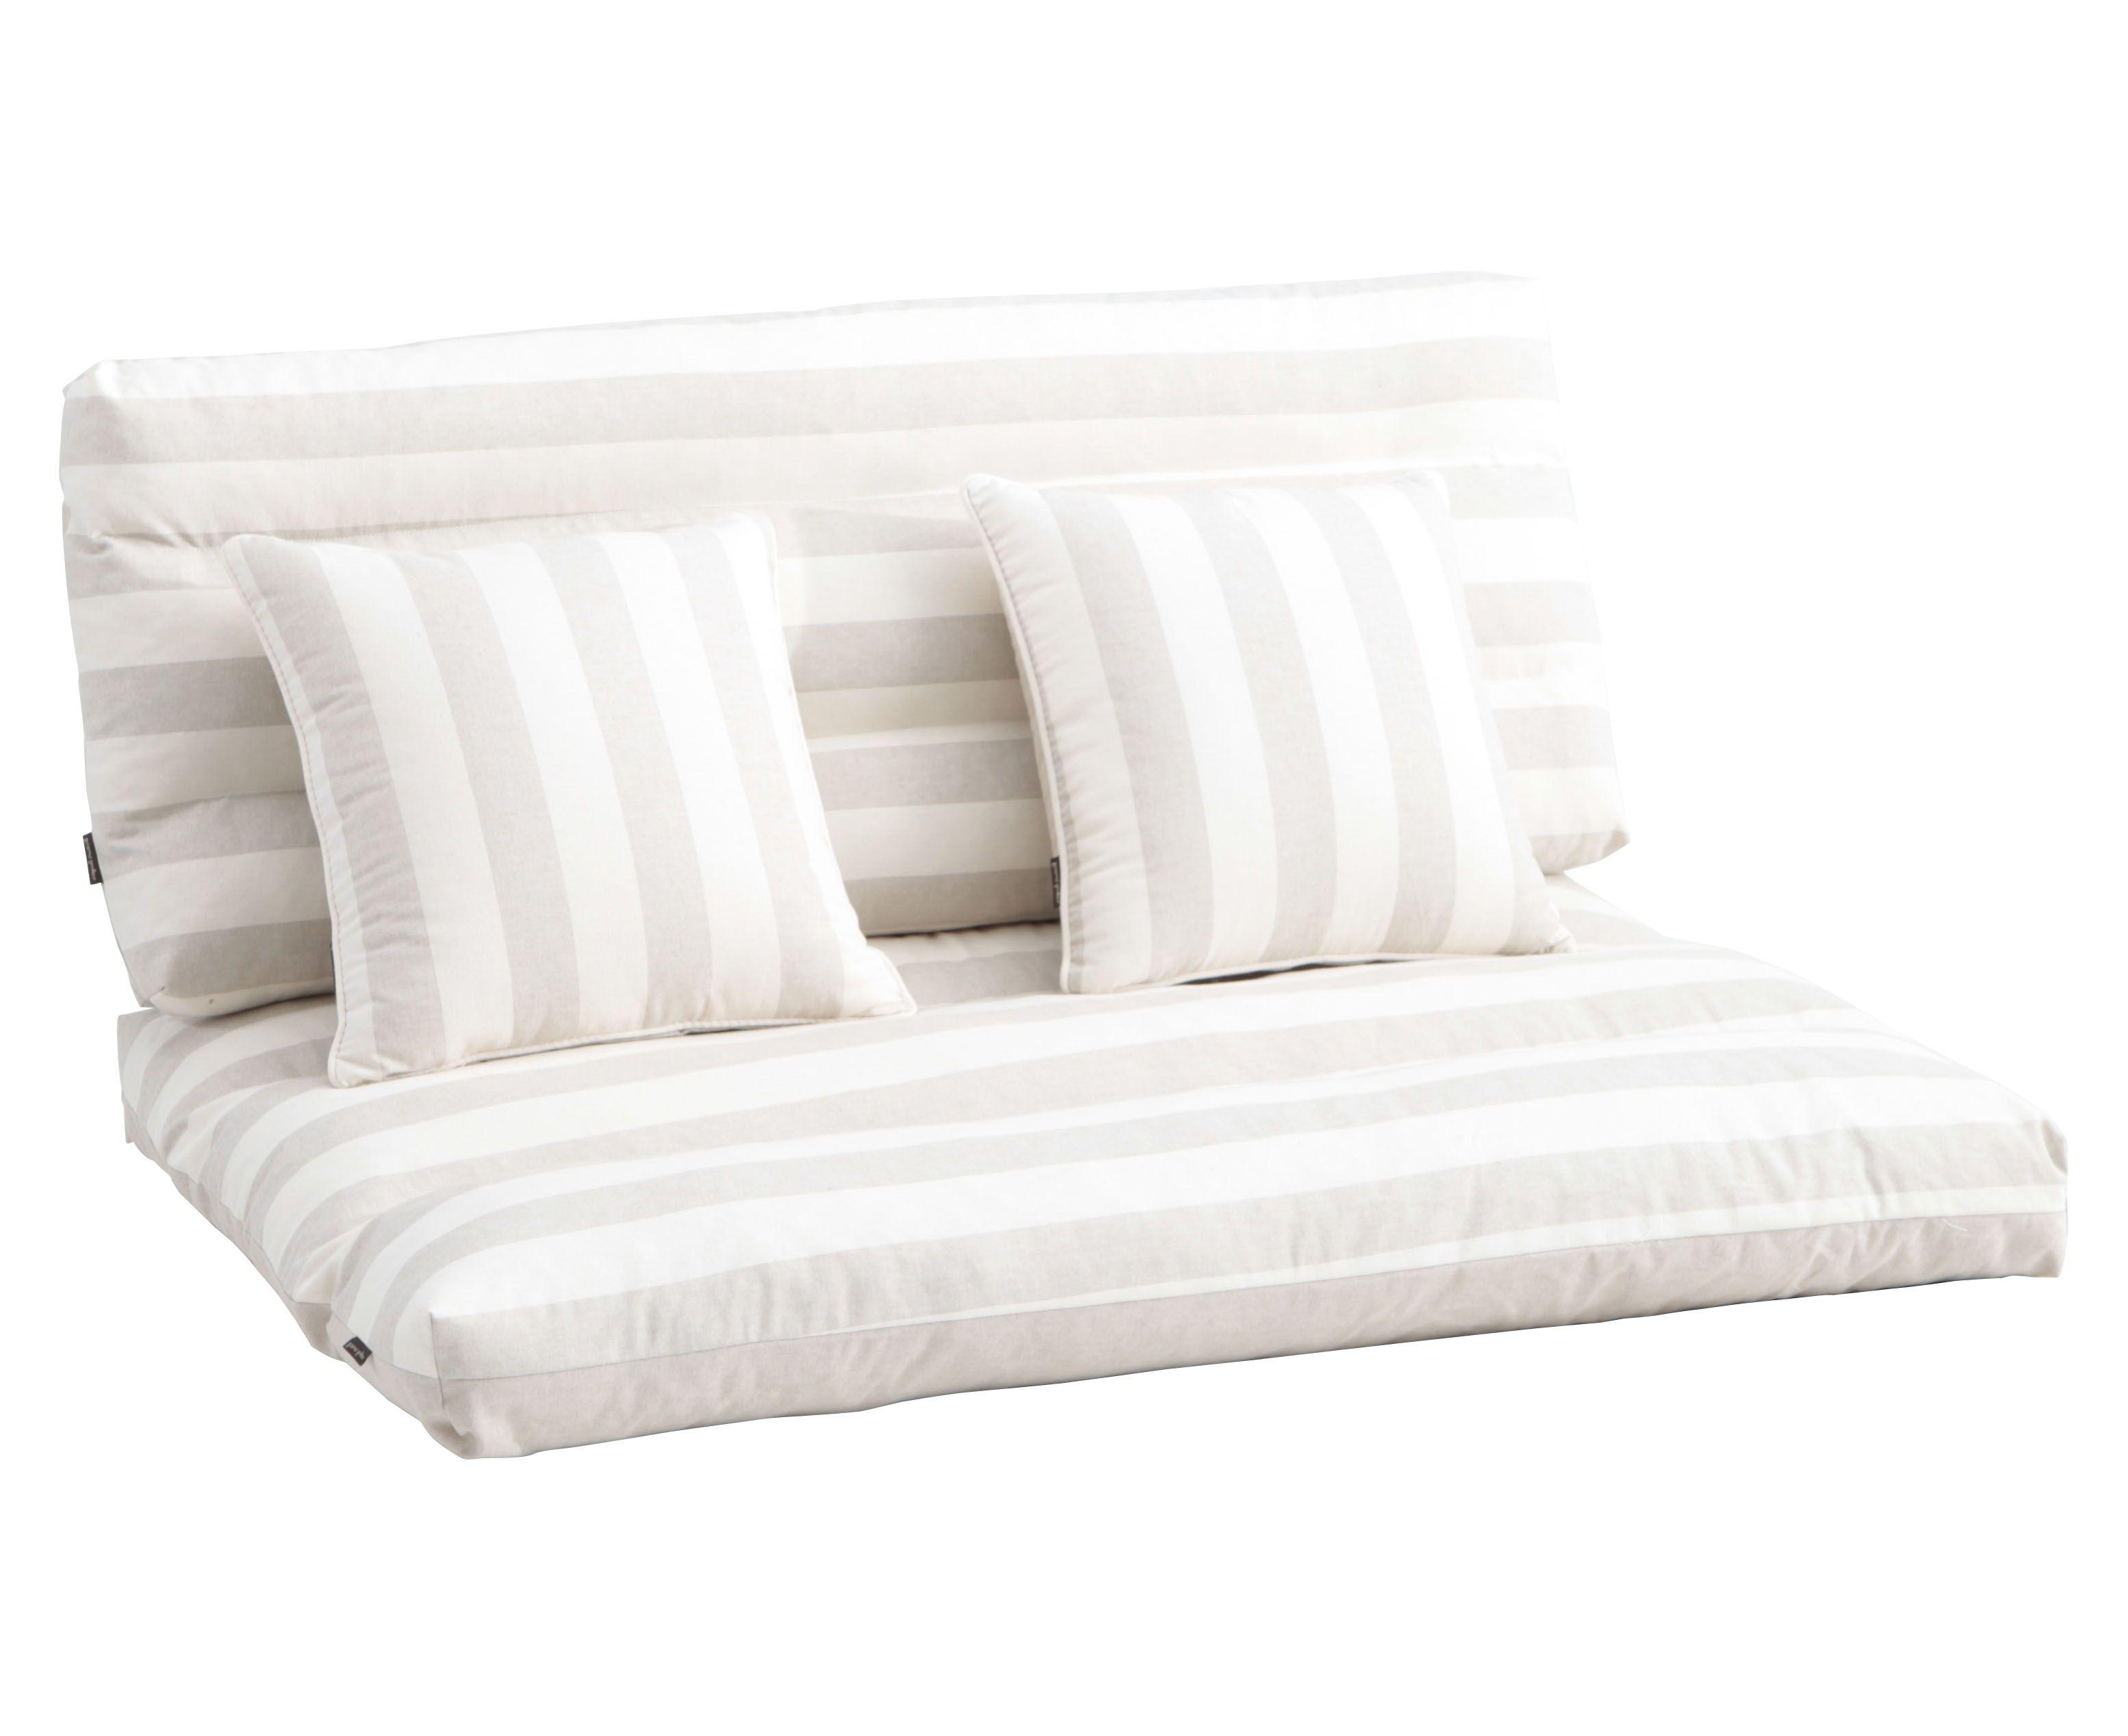 Hacer Cojines Exterior.San Sebastian De Los Reyes Seating In 2019 Bed Pillows